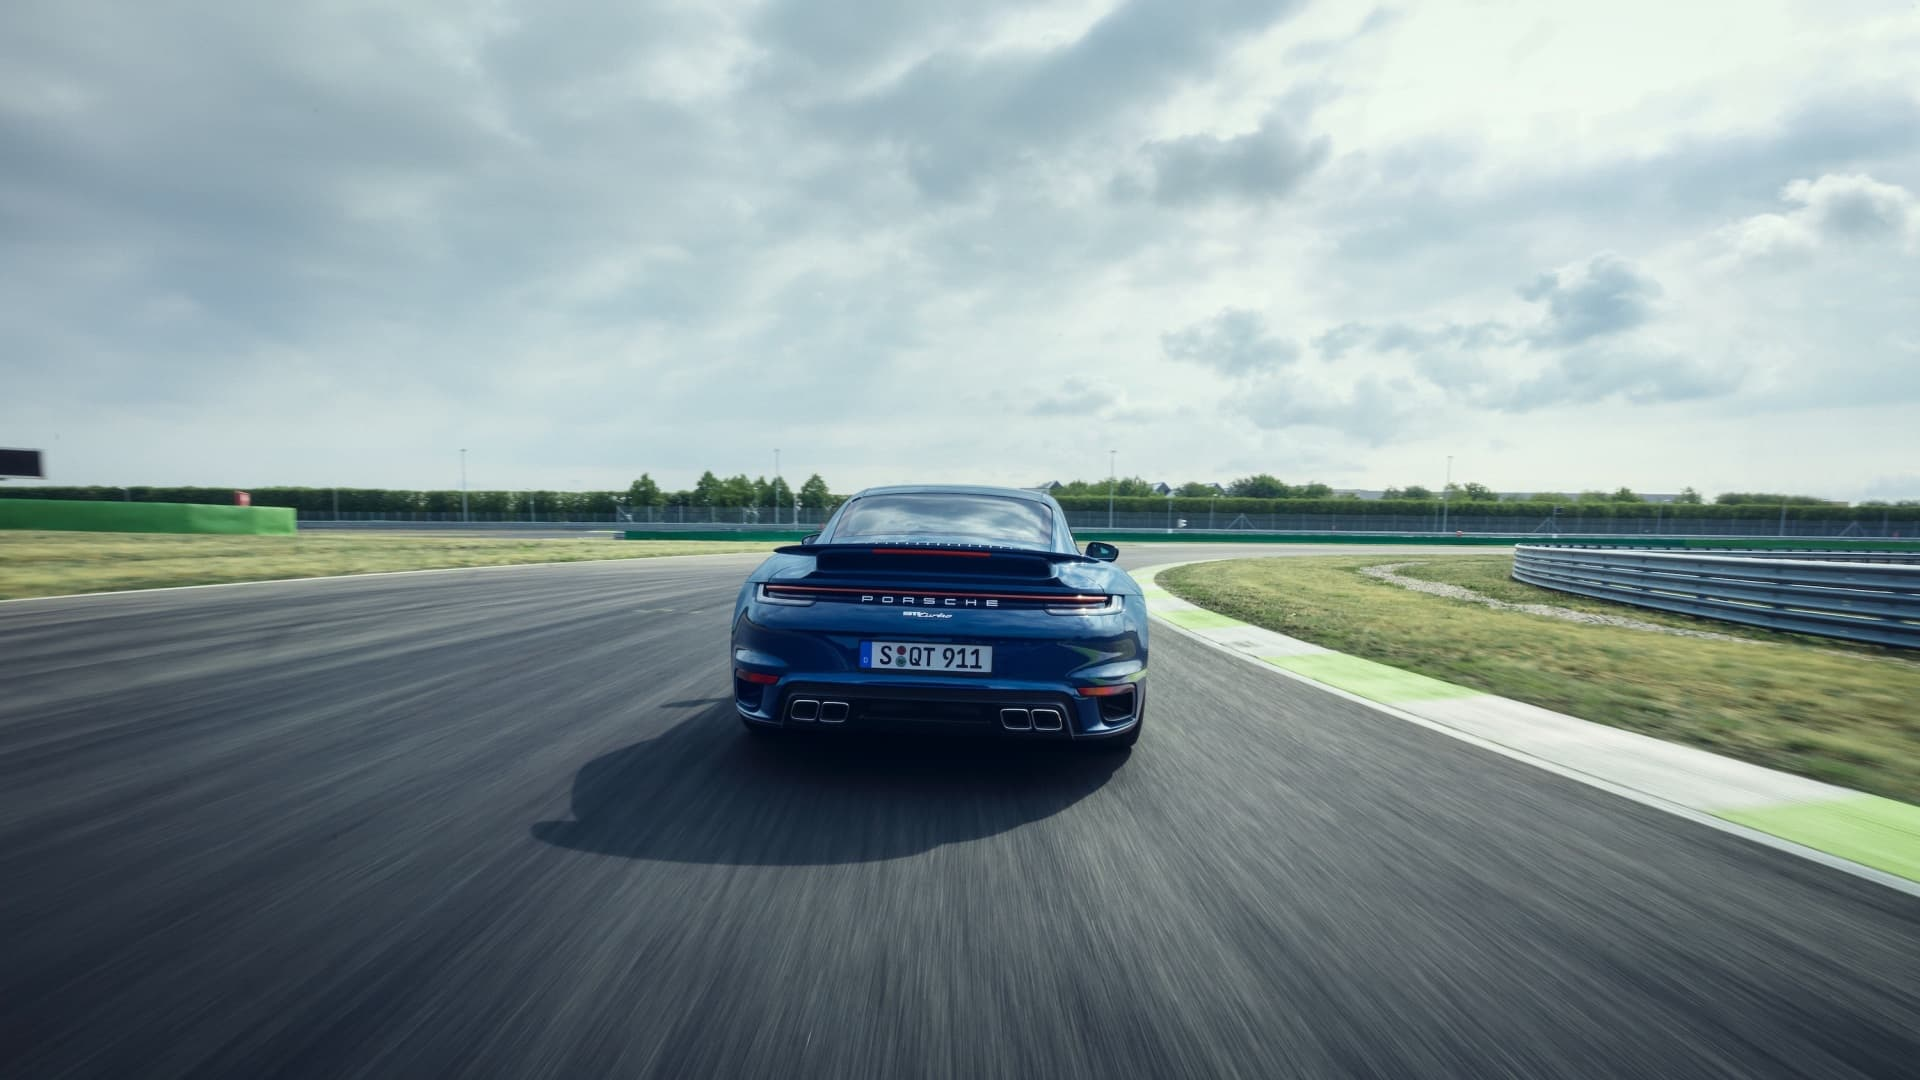 Porsche 911 Turbo 2020 Img 4